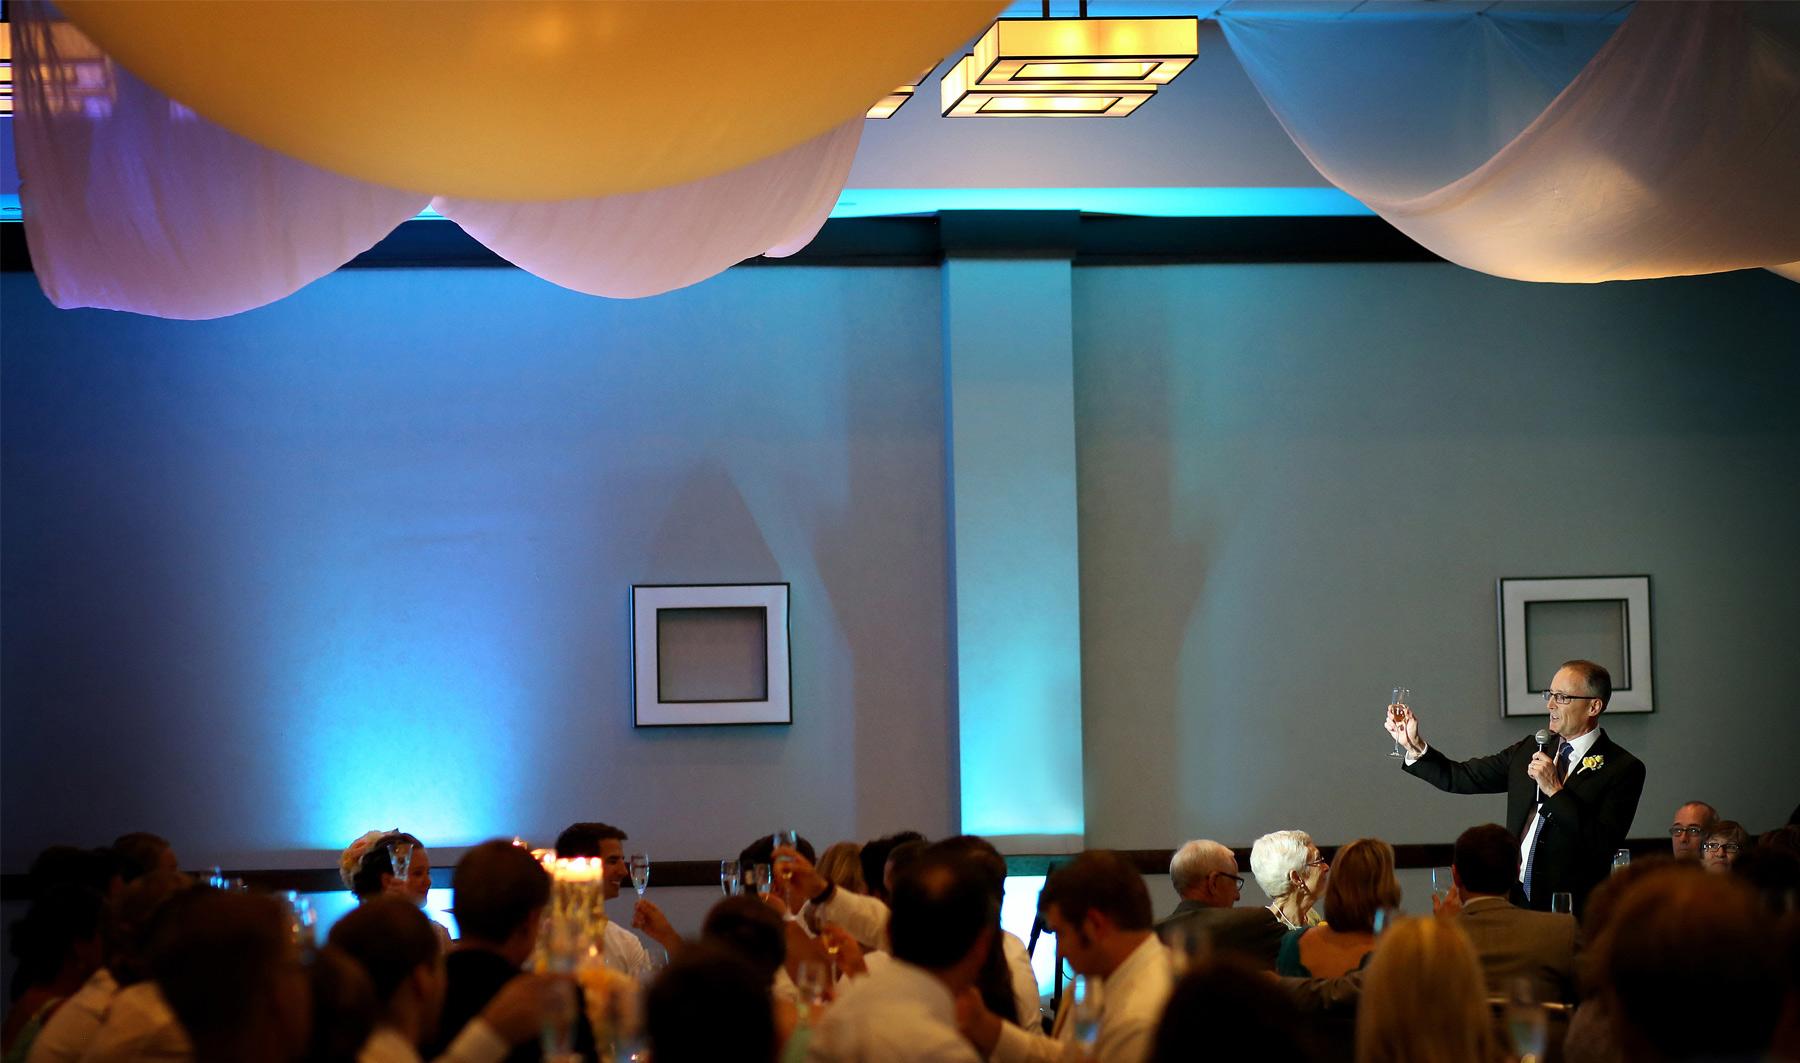 15-Minneapolis-Minnesota-Wedding-Photography-by-Vick-Photography-Edina-Westin-Hotel-Reception-Toasting-Grace-&-Nick.jpg